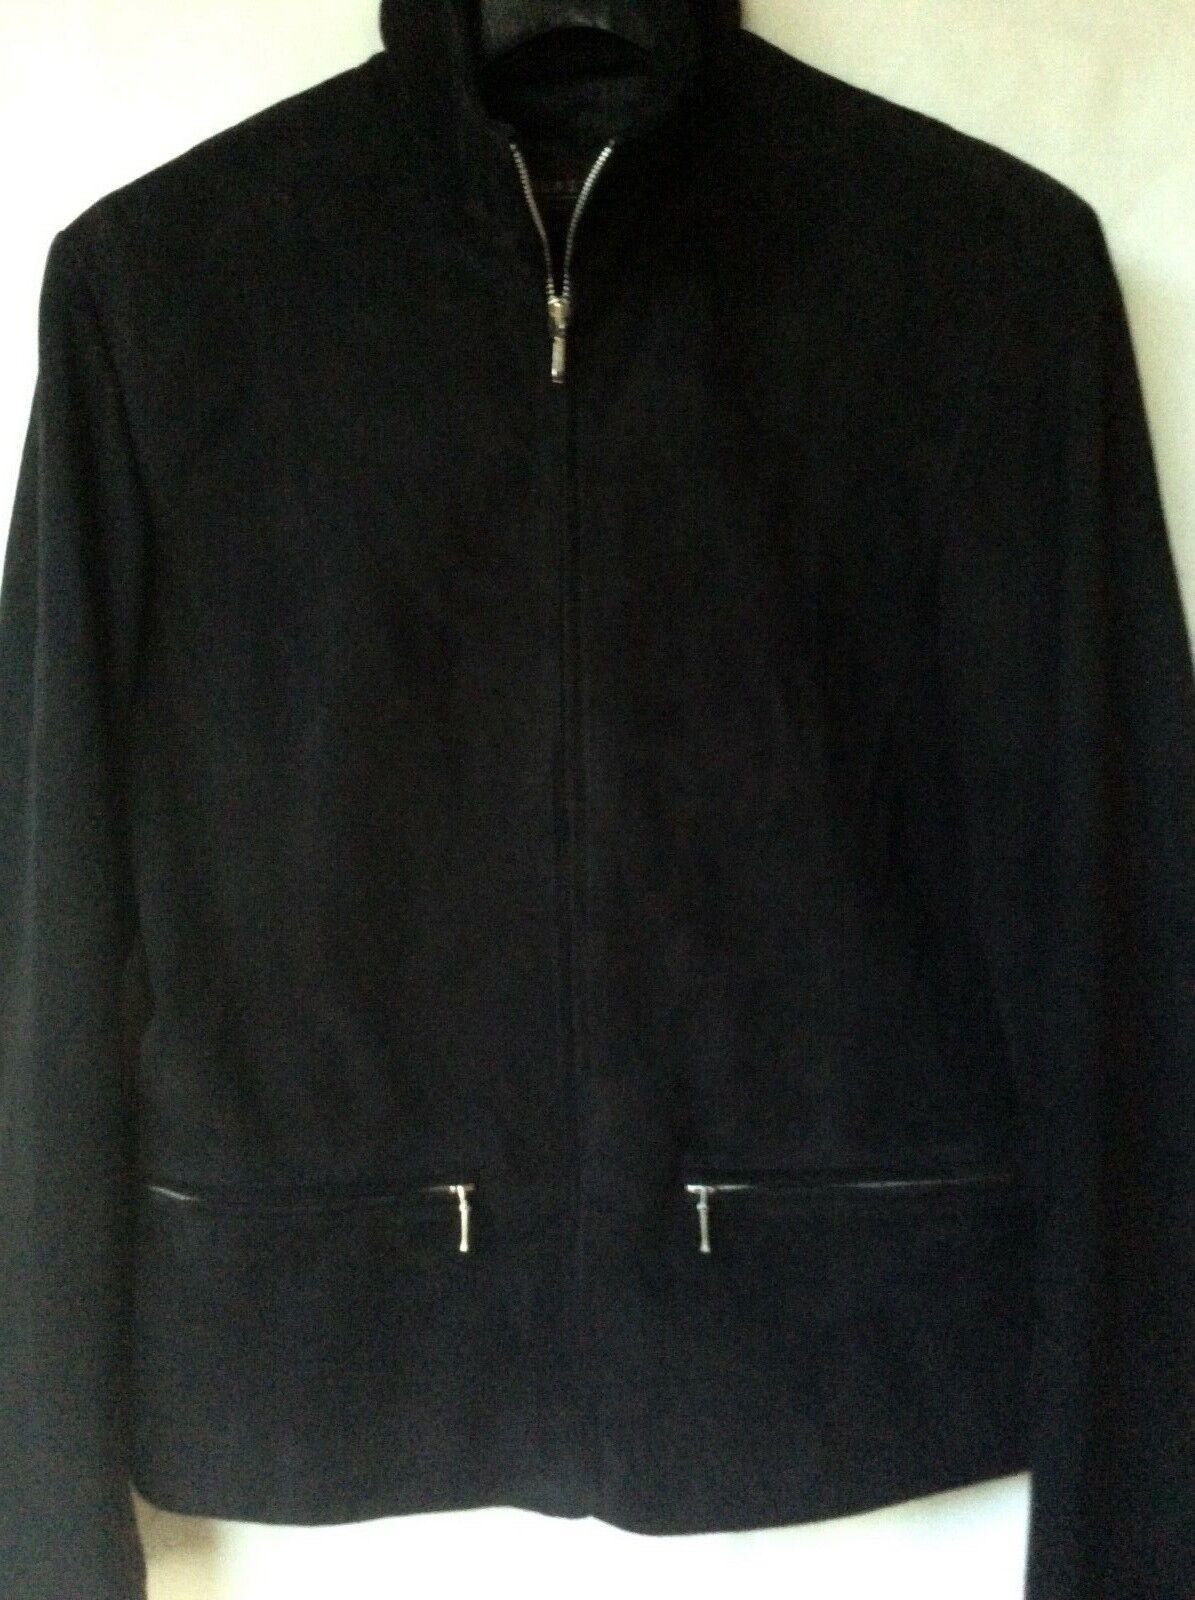 Femme Designer Julia S. Roma 100% Cuir Daim Zip Veste noire taille 10 14